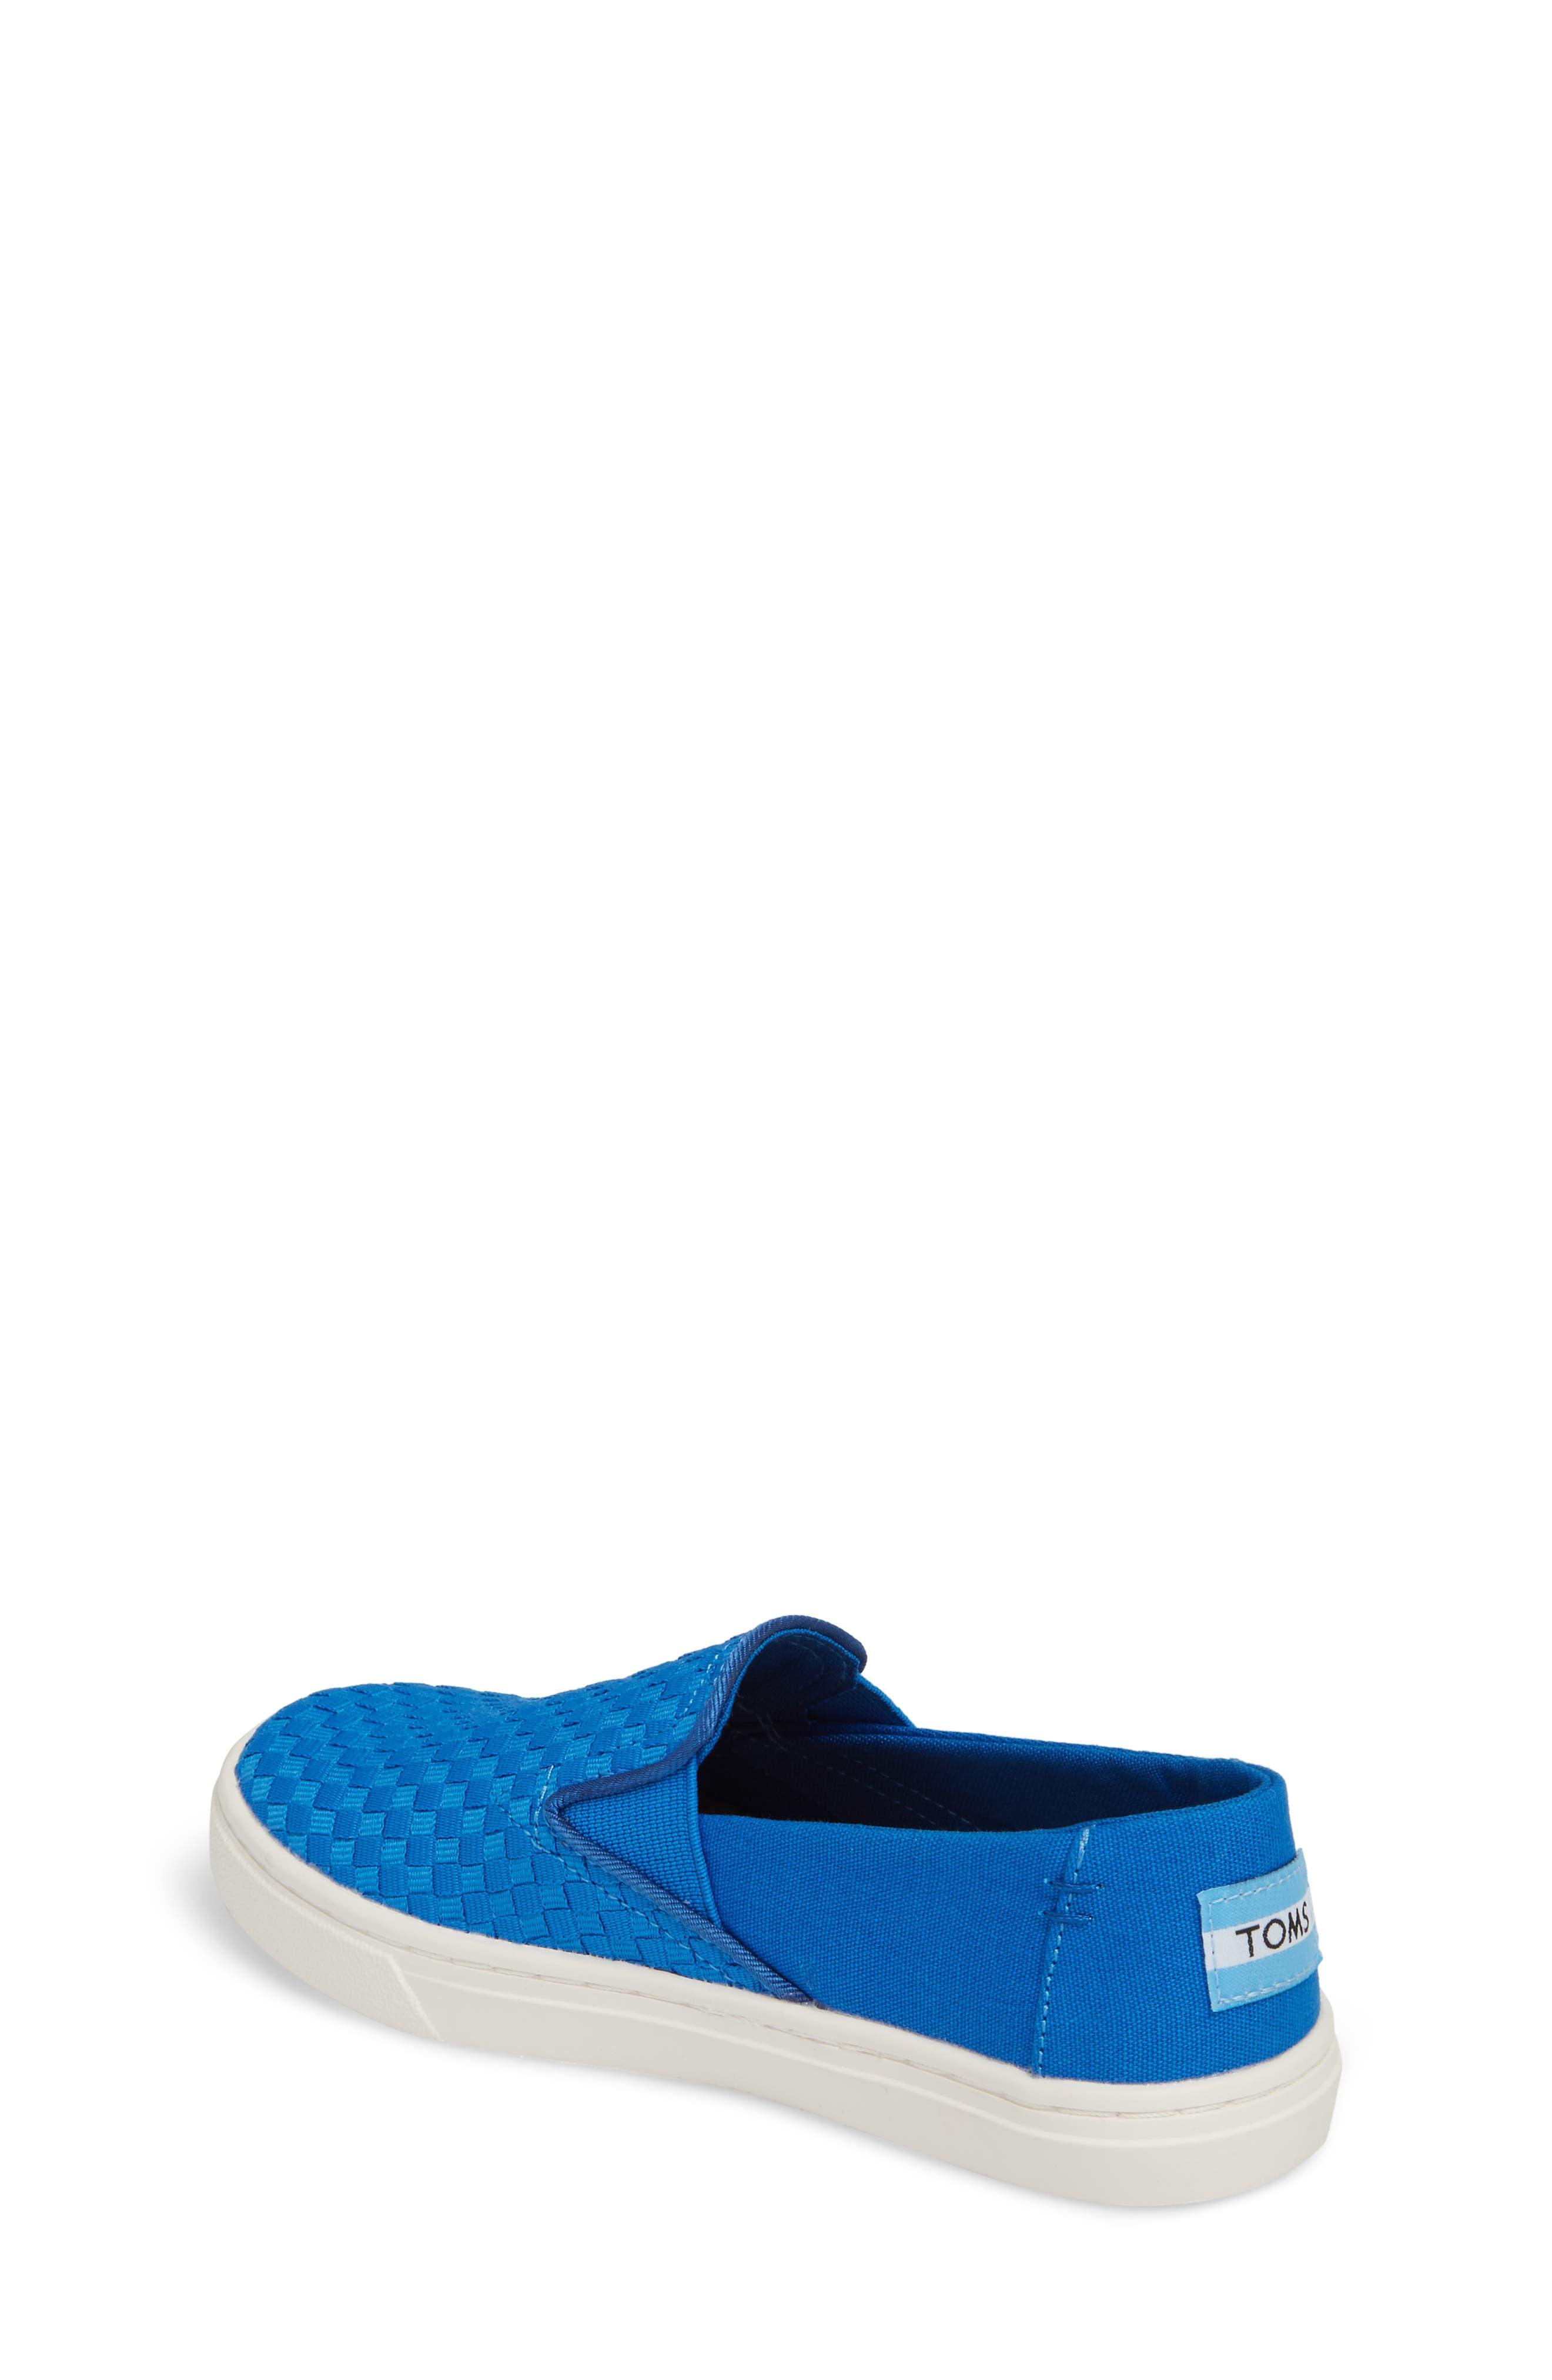 Luca Slip-On Sneaker,                             Alternate thumbnail 2, color,                             Imperial Blue Basketweave